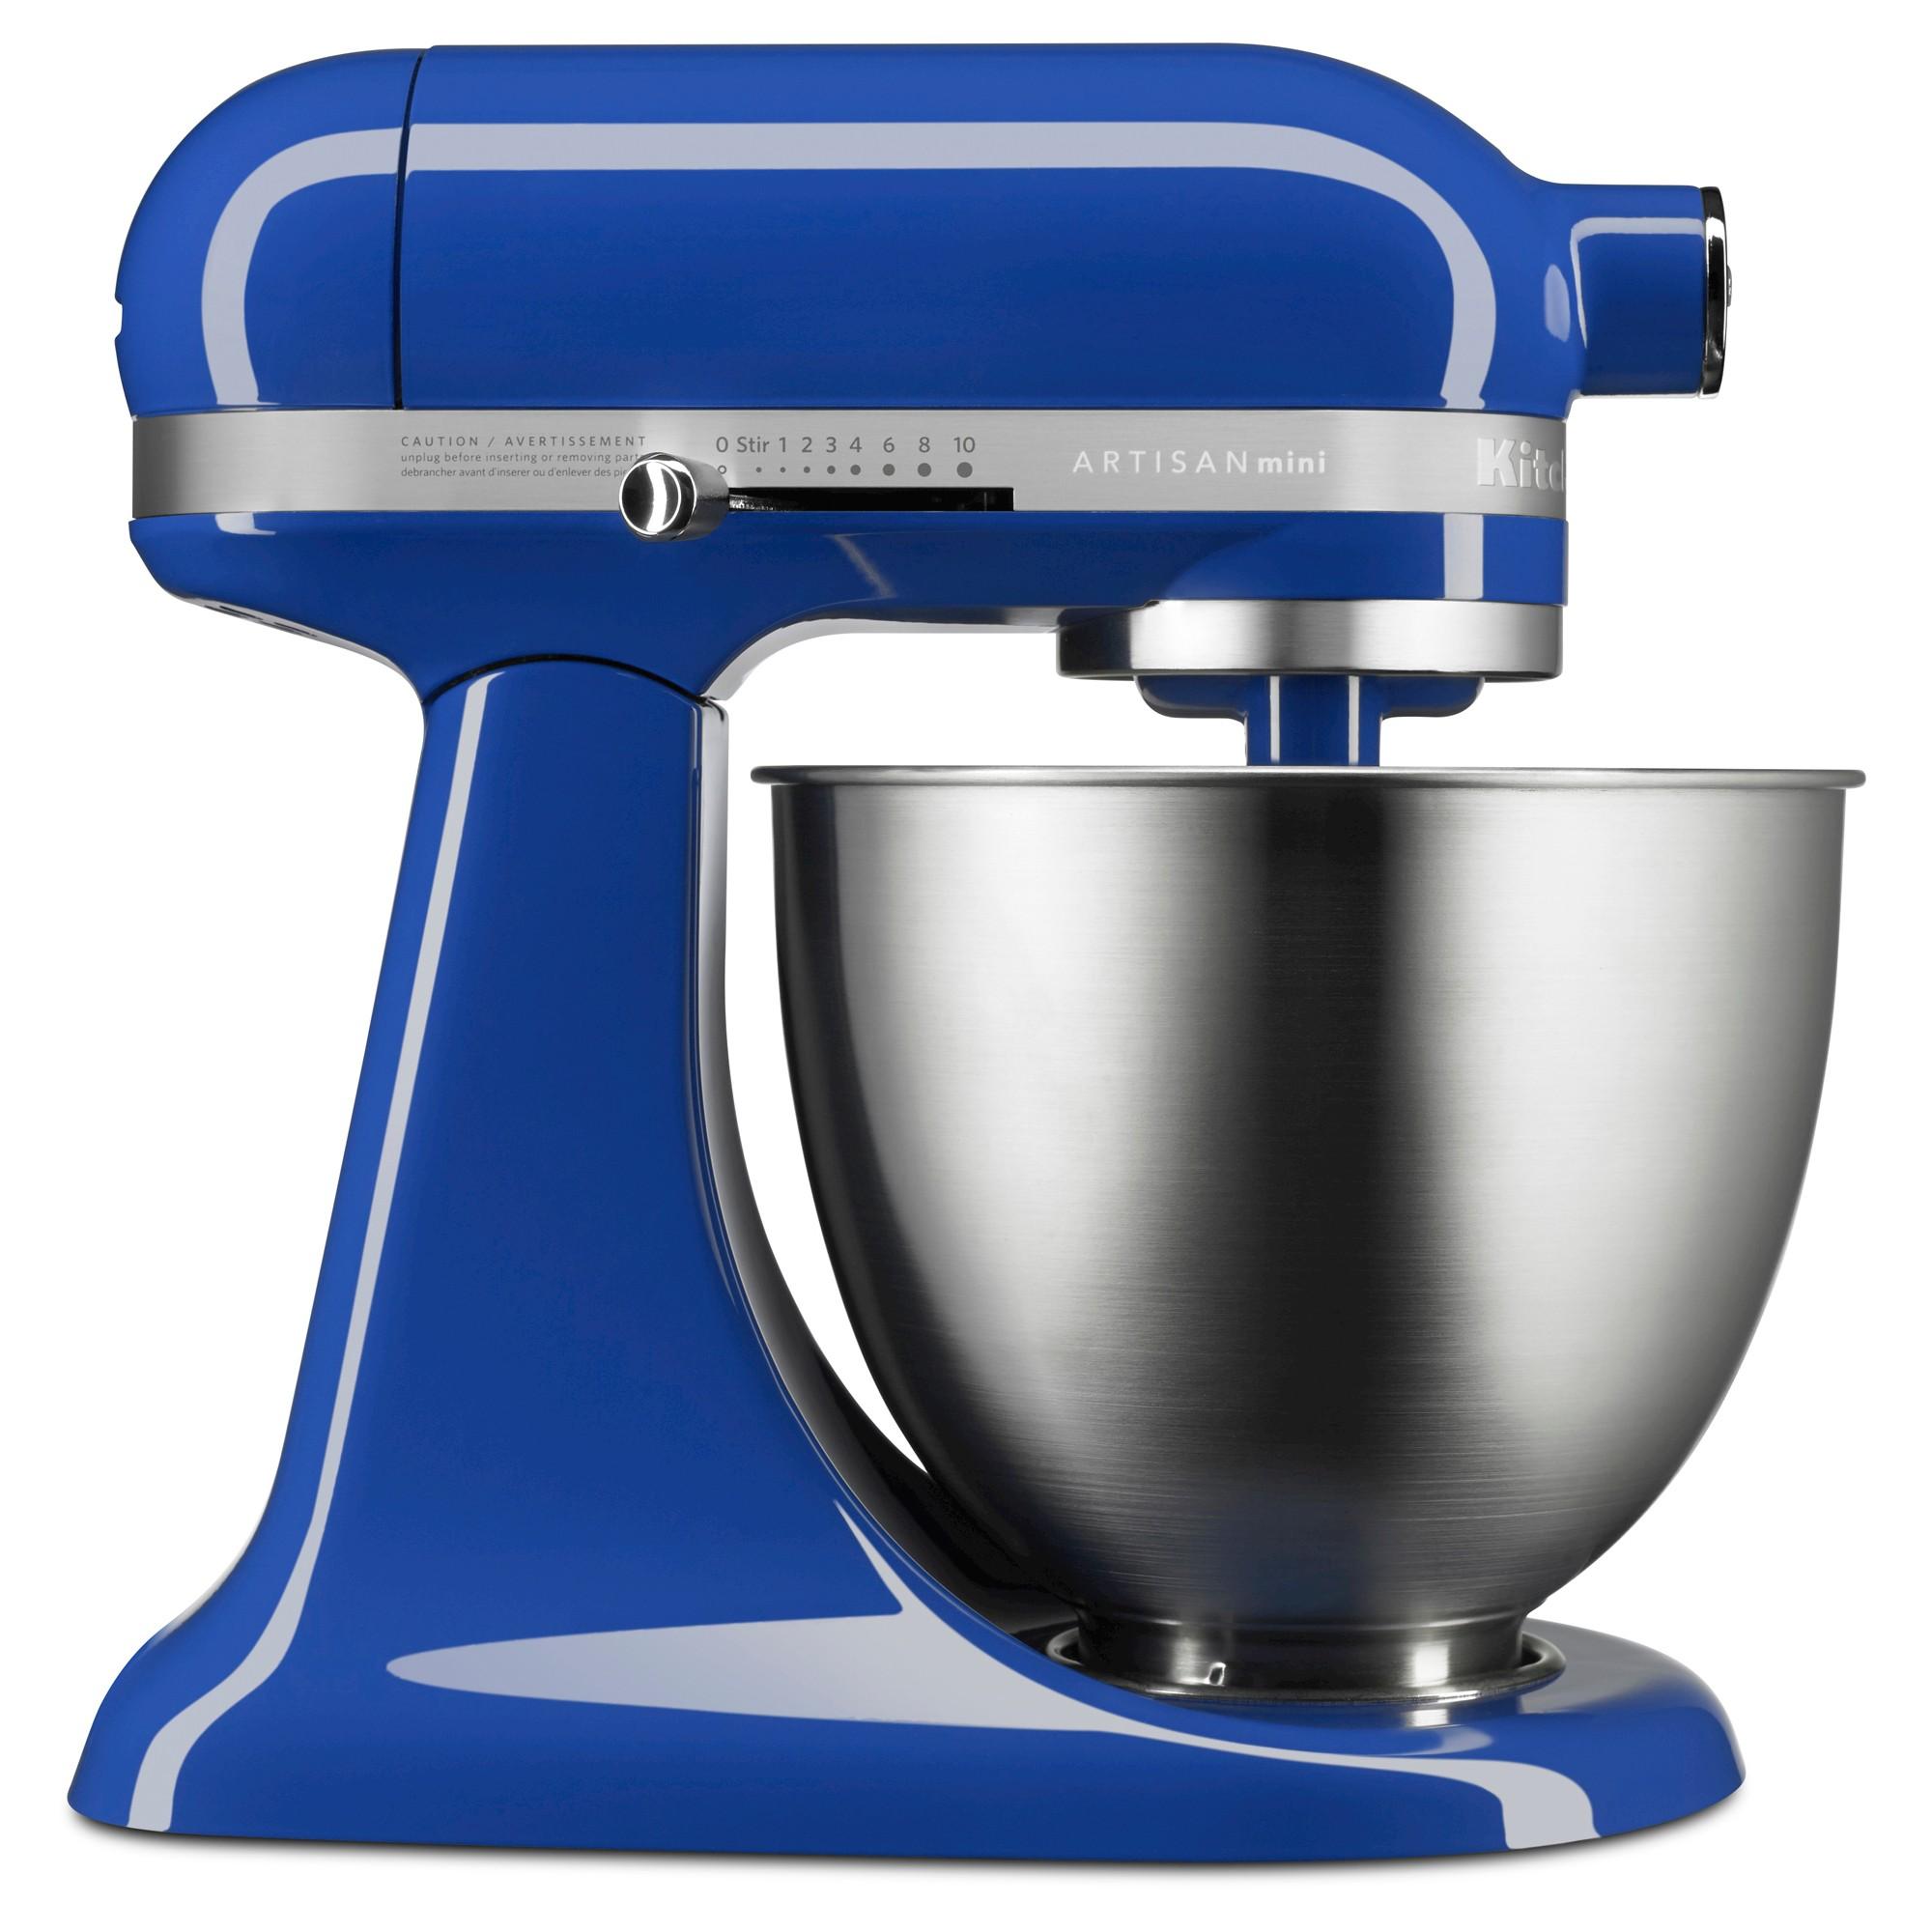 Kitchenaid Artisan Mini 3 5 Quart Tilt Head Stand Mixer Ksm3311x